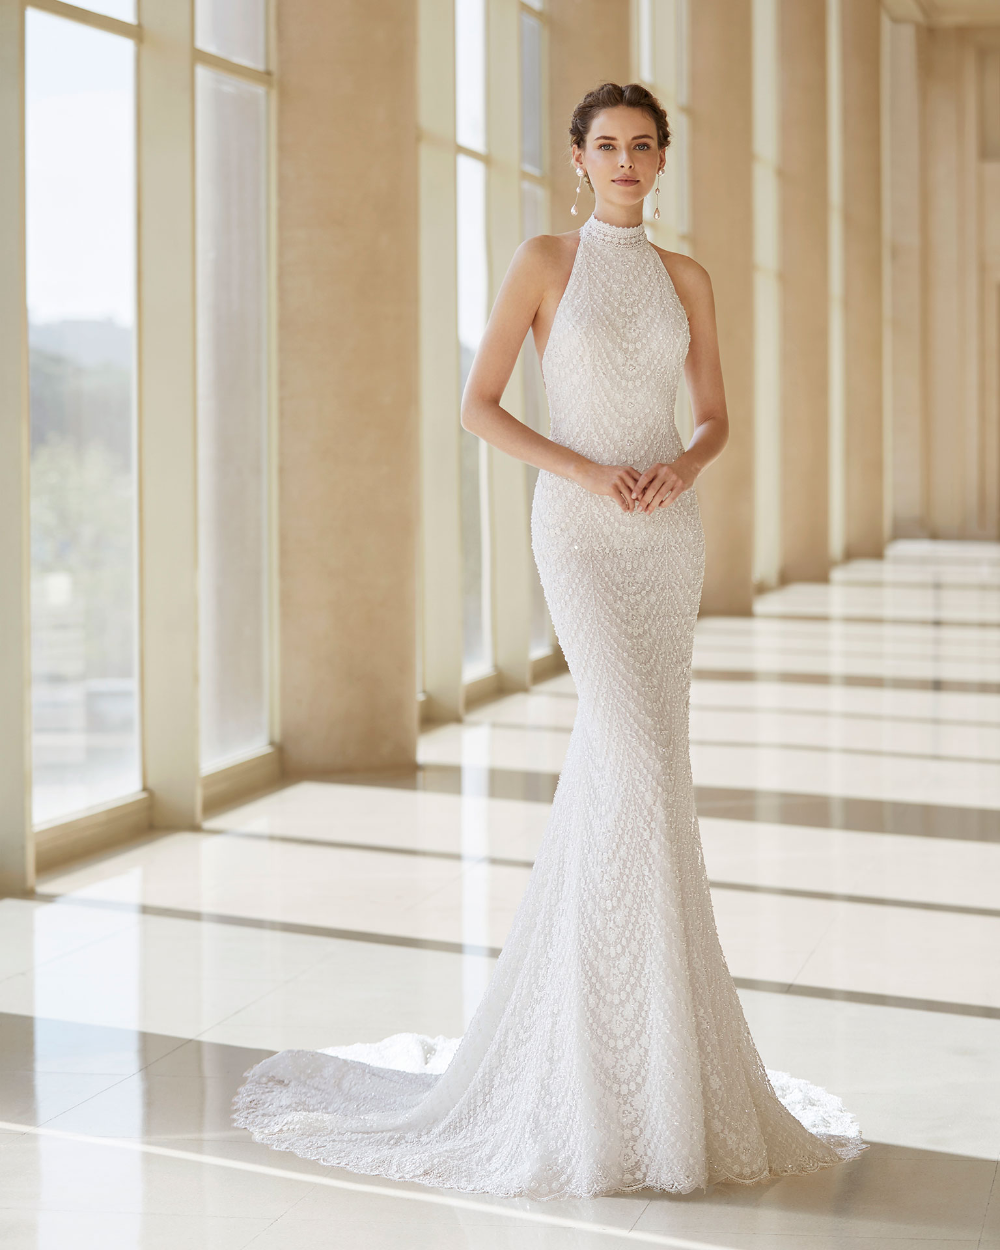 Selva Bridal 2020 Rosa Clara Couture Collection Figure Flattering Wedding Dress Flattering Wedding Dress Rosa Clara Wedding Dresses